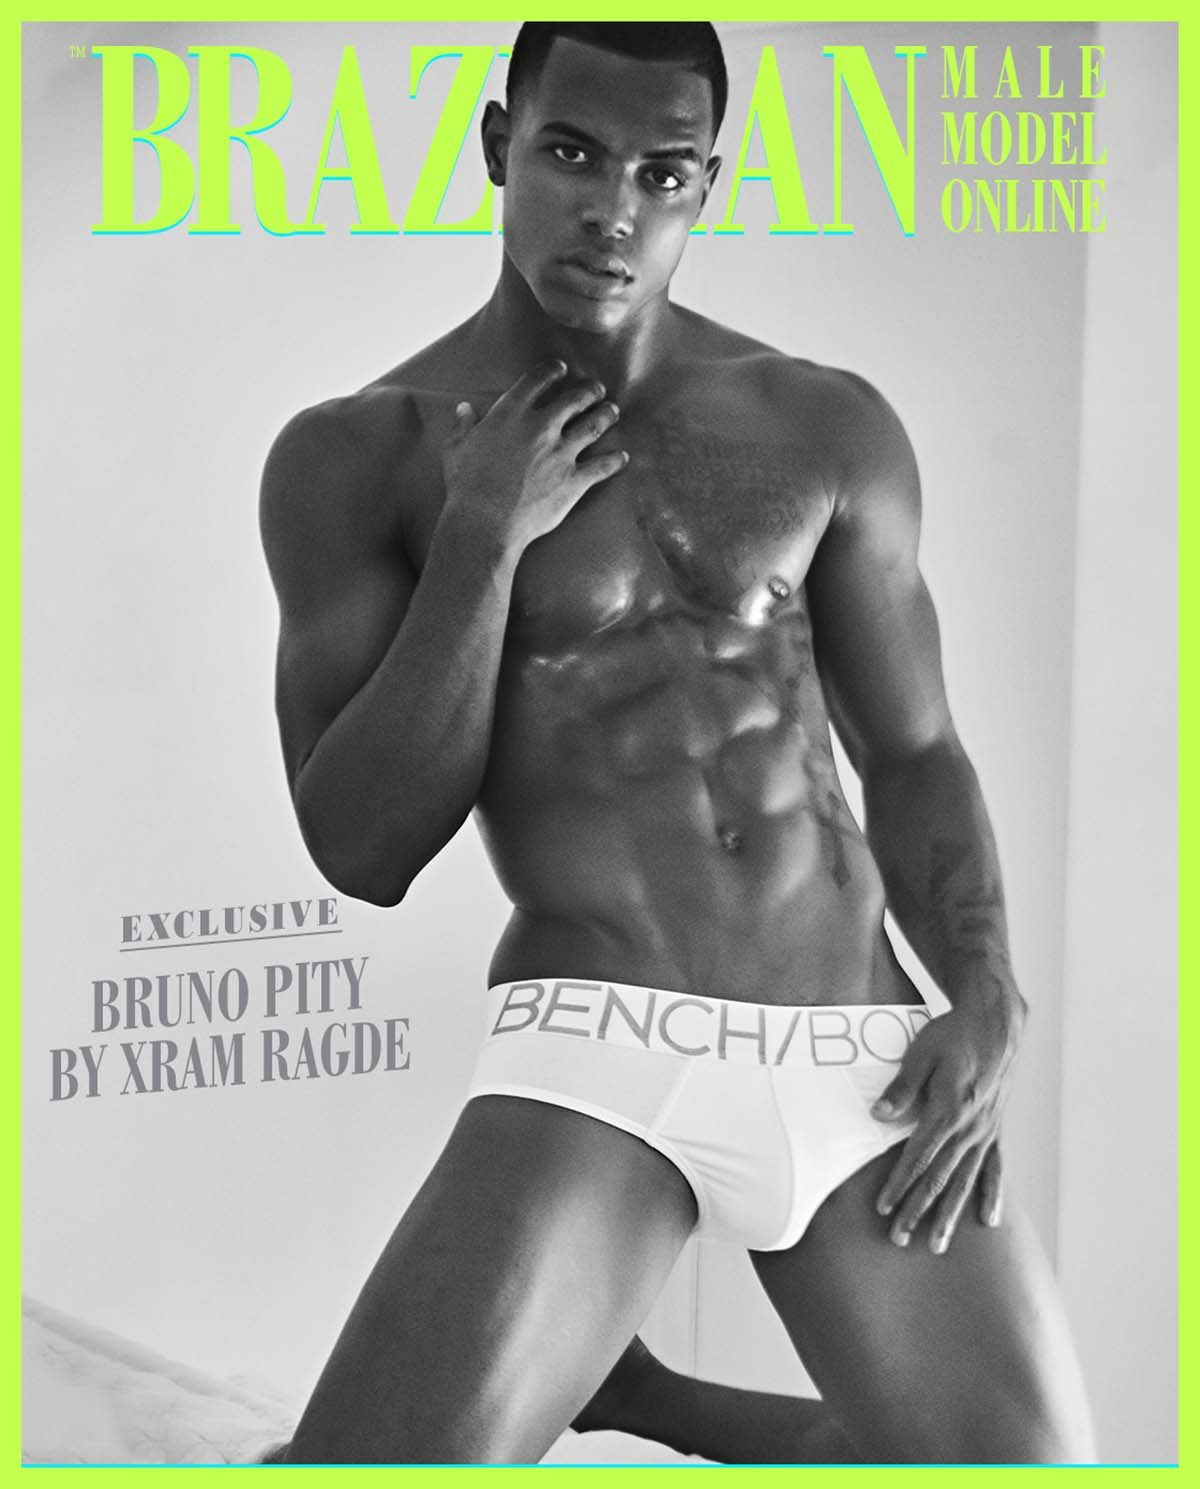 Bruno Pity by Xram Ragde